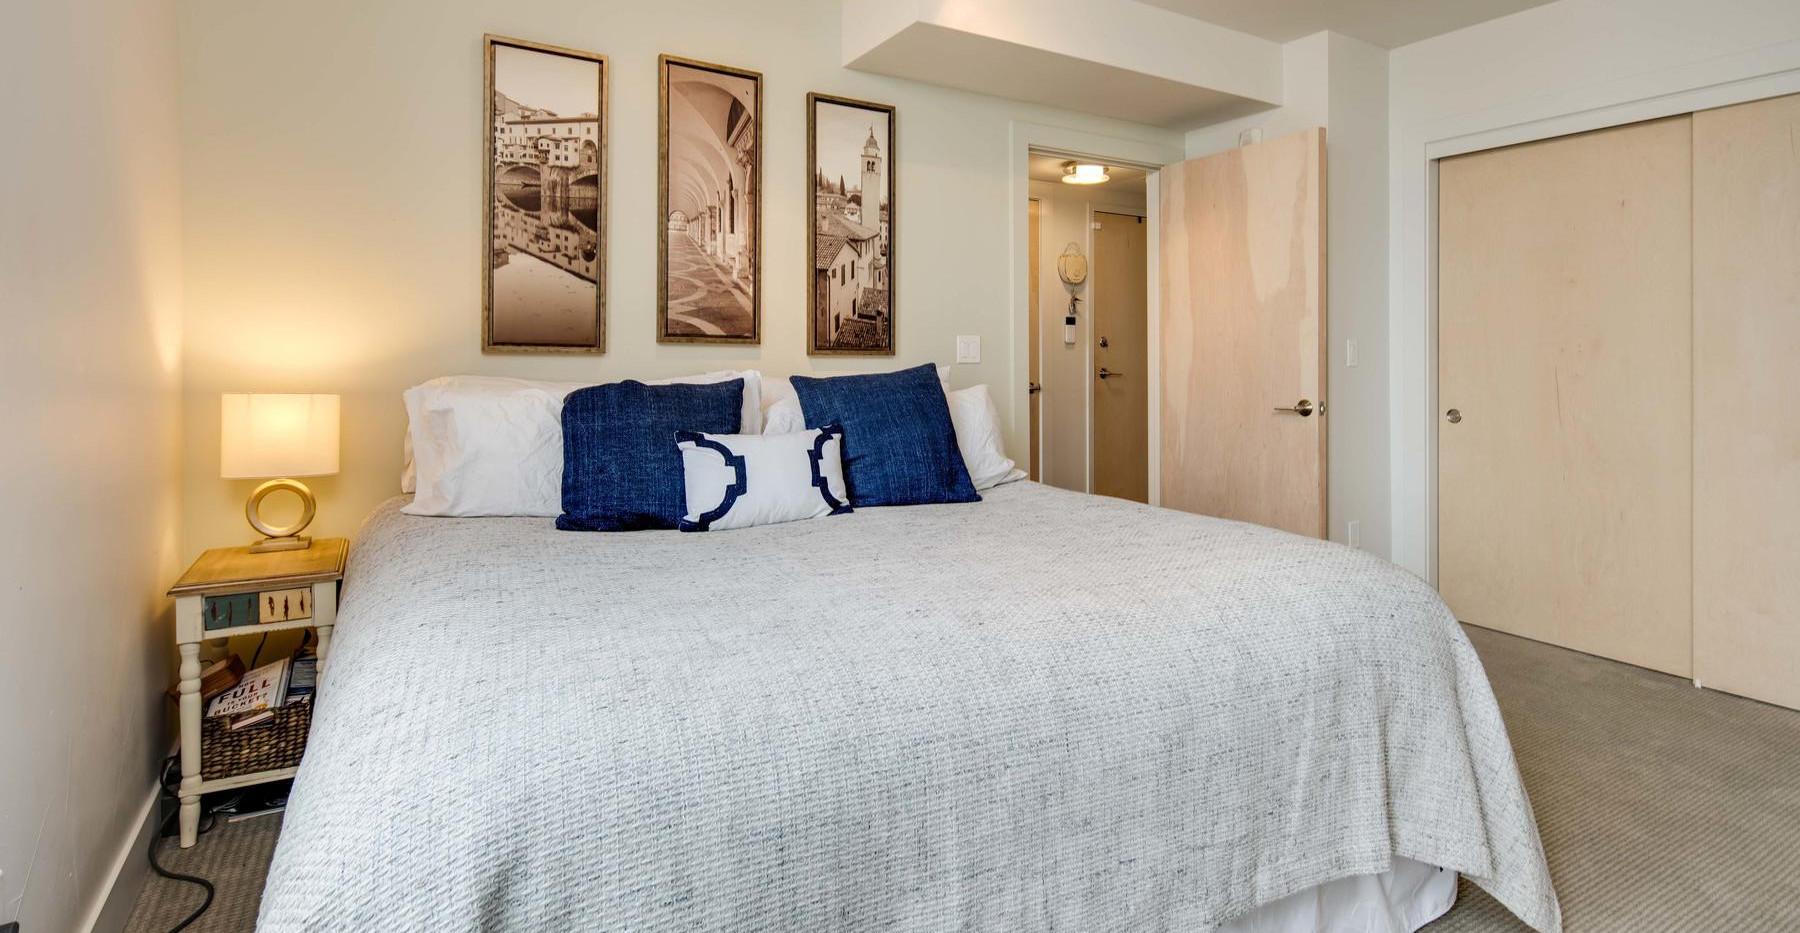 3434 Tejon Street-025-031-Bedroom-MLS_Si